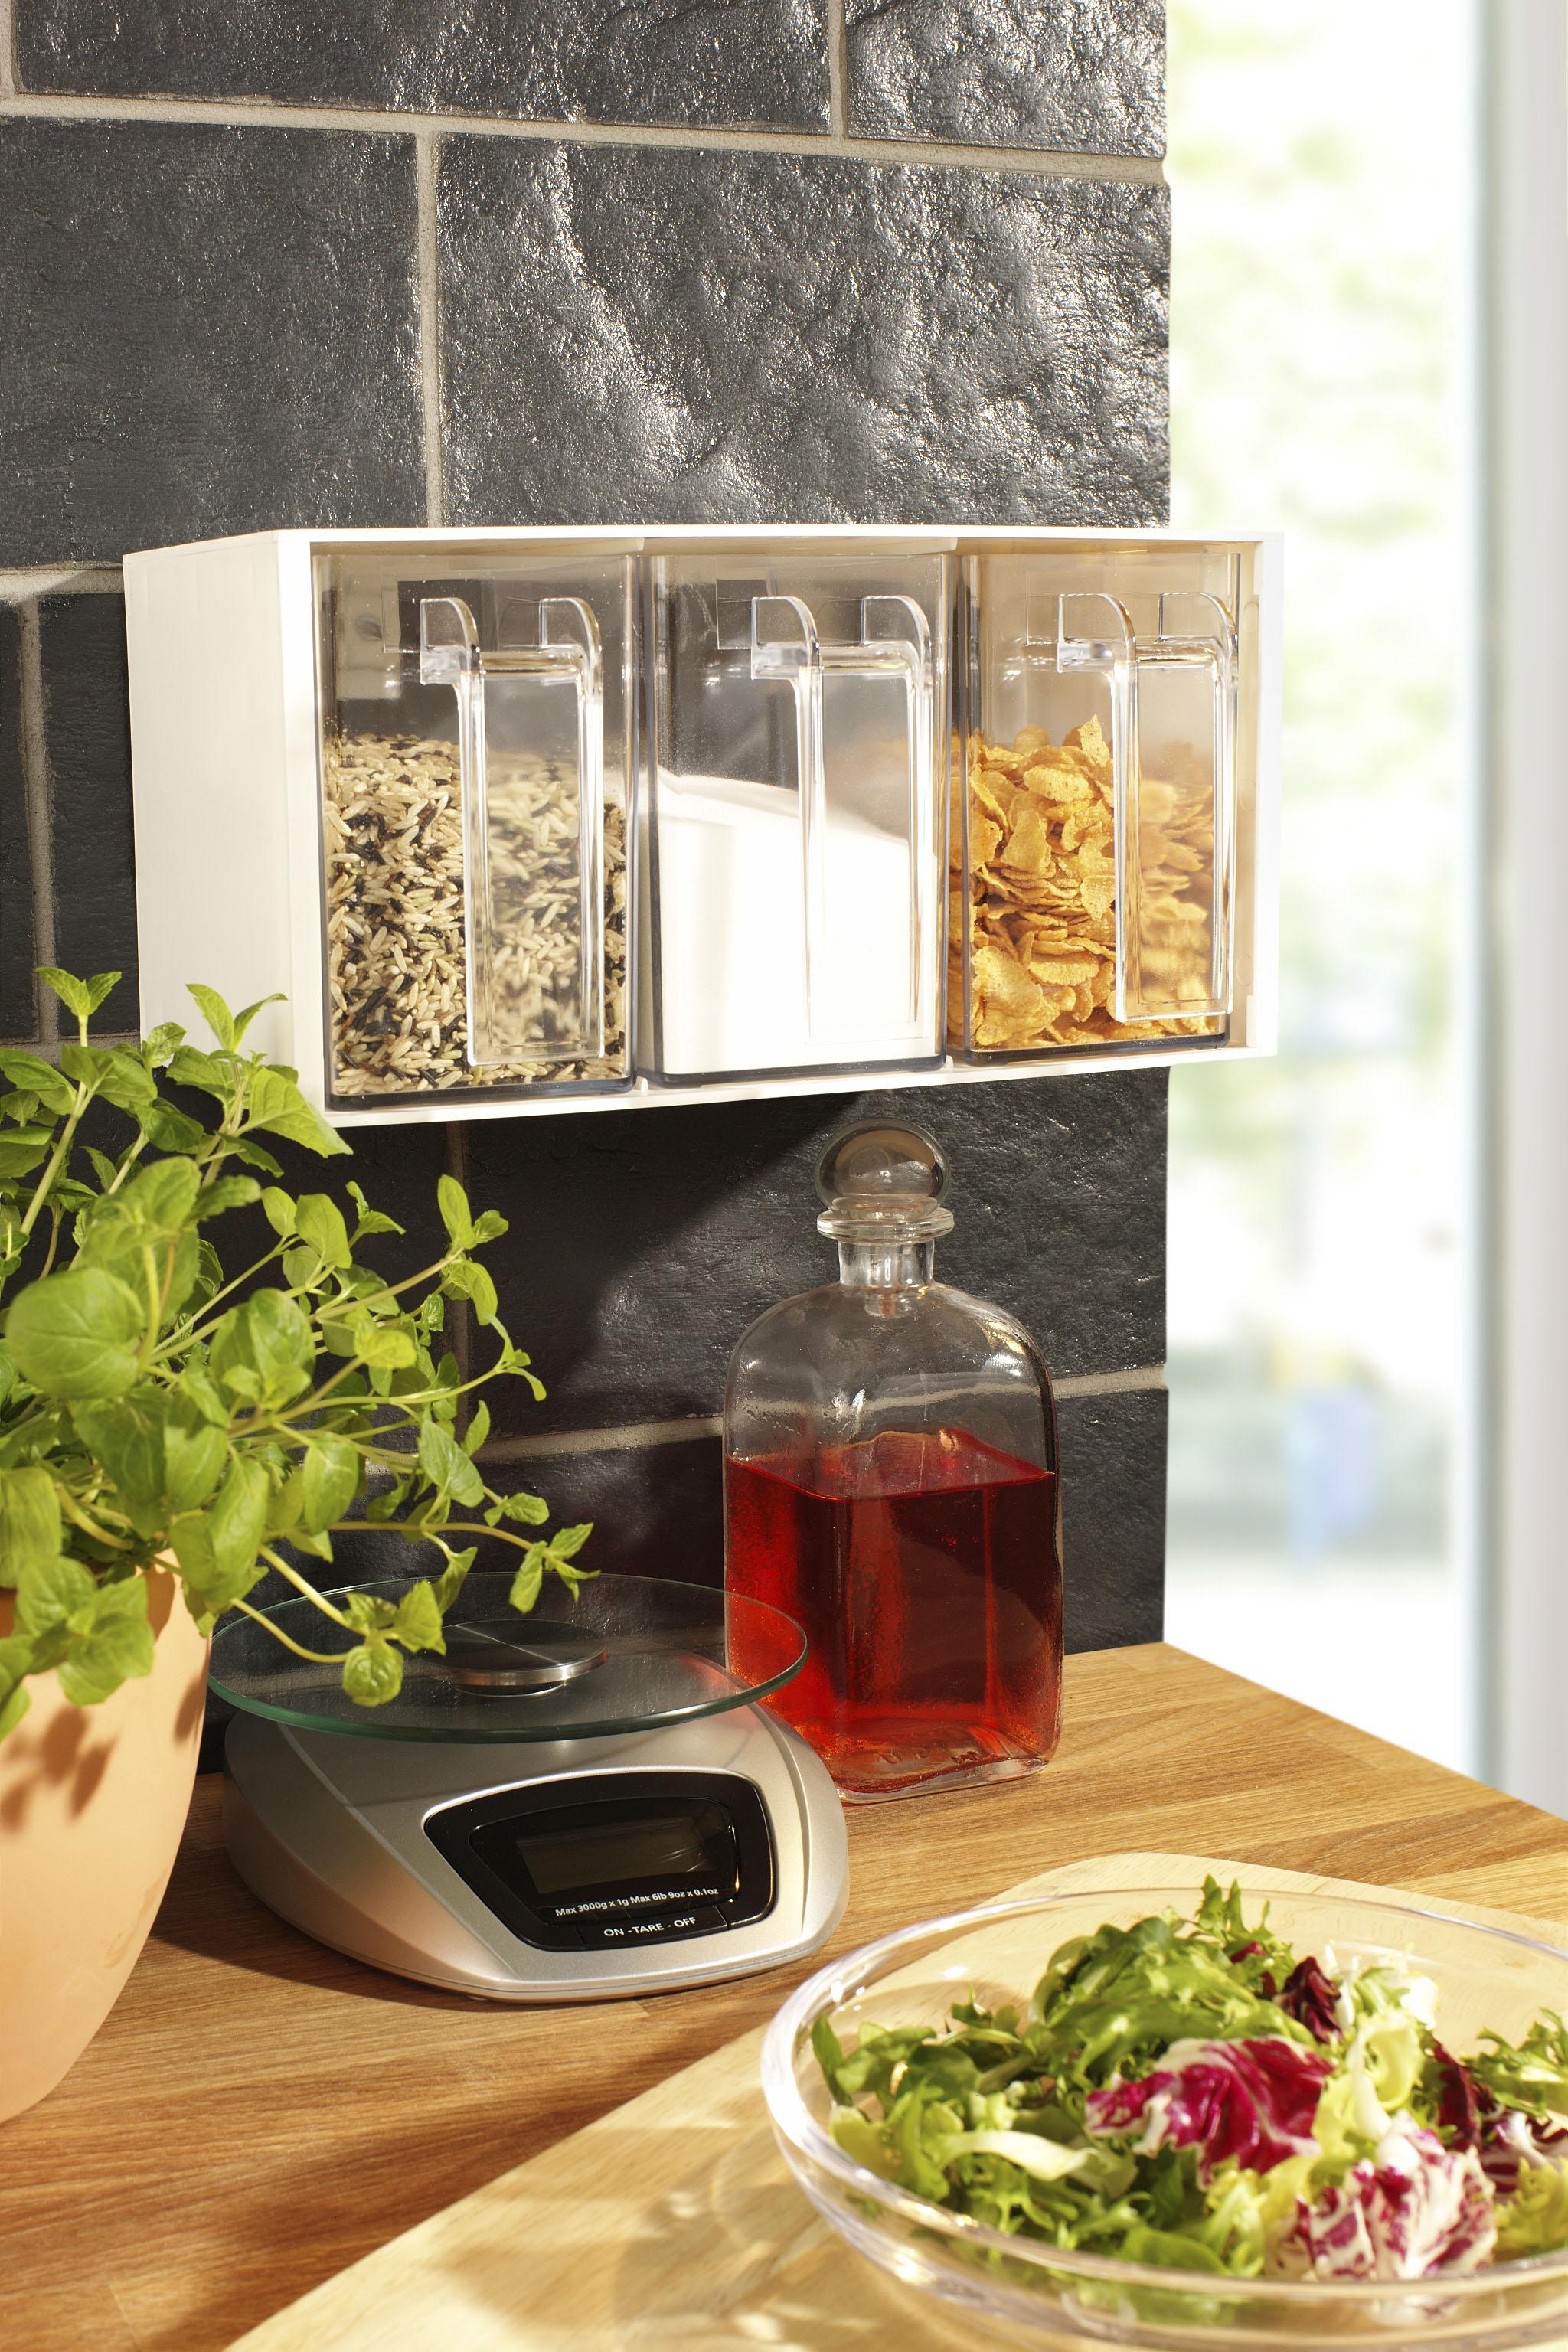 Ruco Aufbewahrungssystem, (Set, 2 tlg.) farblos Küchen-Ordnungshelfer Küchenhelfer Küche Aufbewahrungssystem 891838